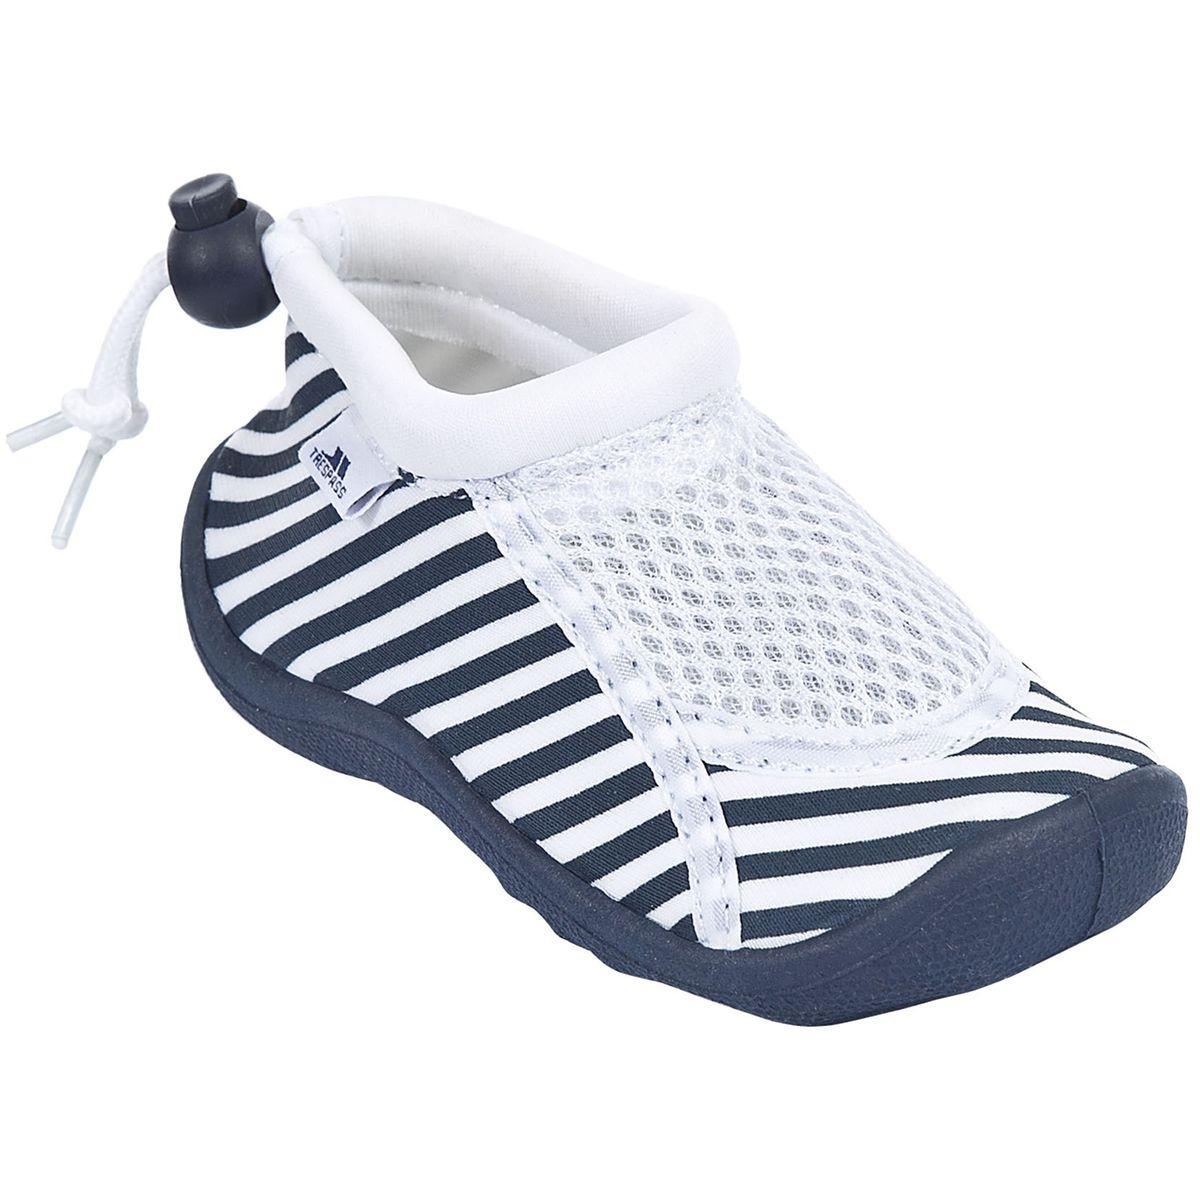 Chaussures aquatiques LEMUR